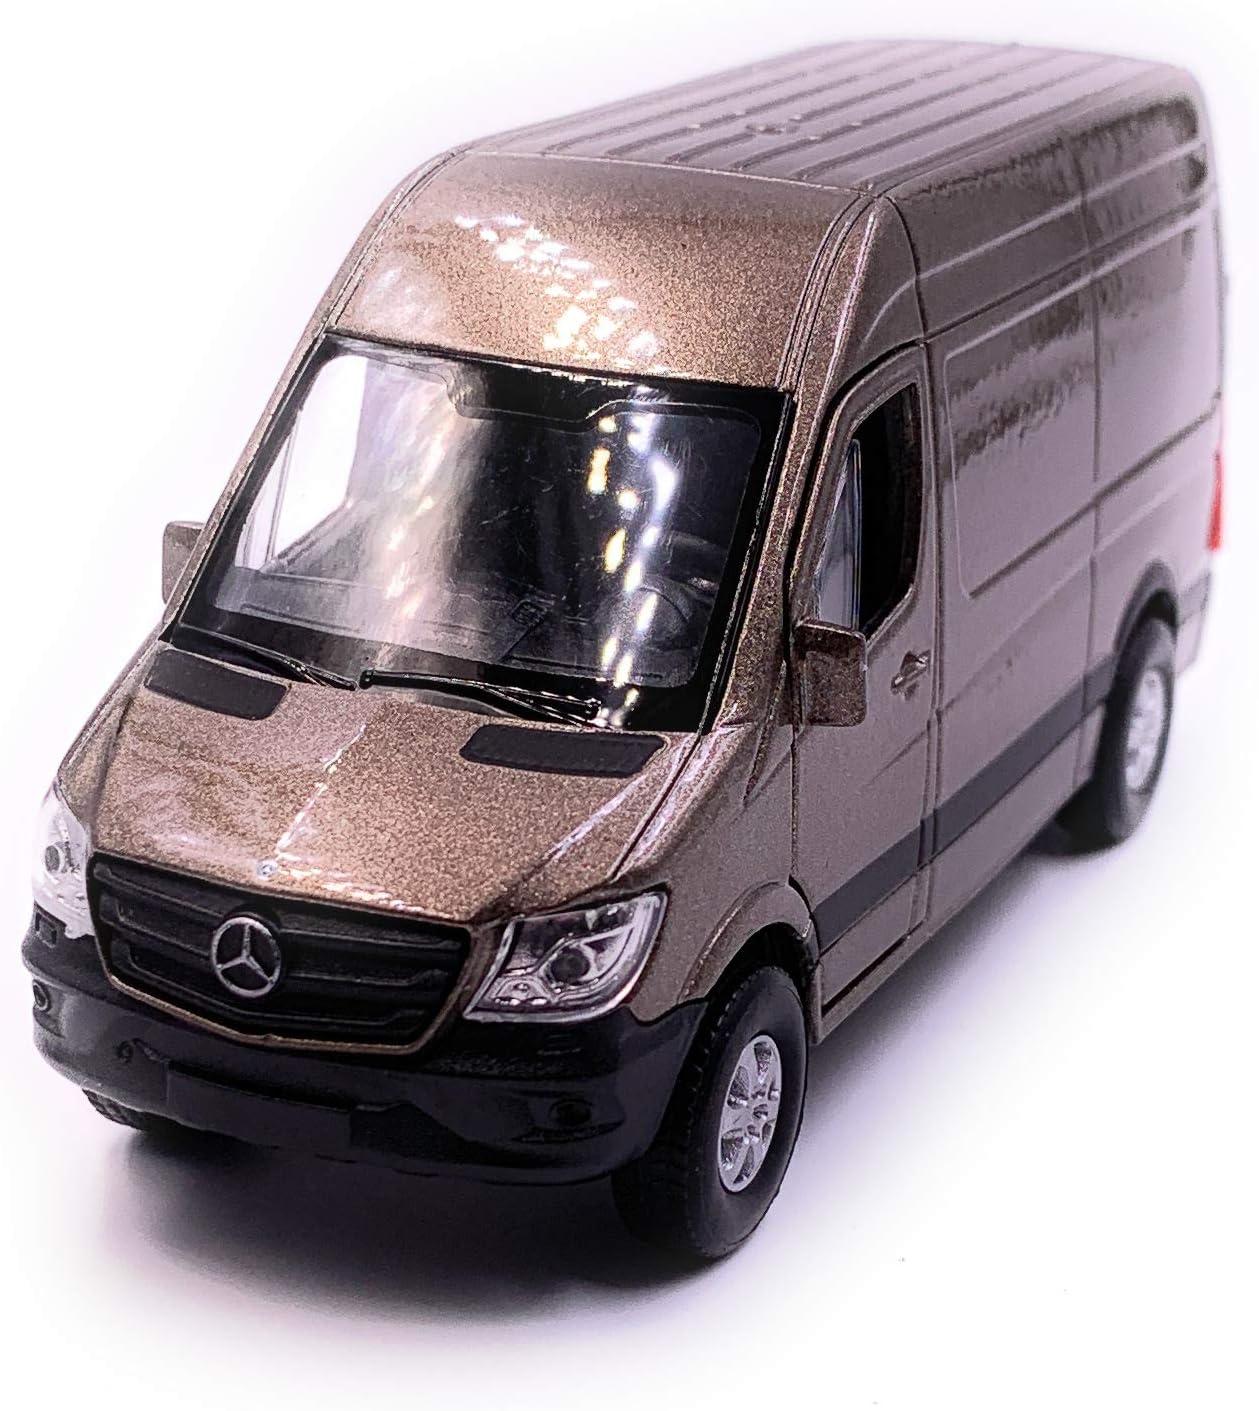 Onlineworld2013 Sprinter Panel Van Gold Modellauto Auto Maßstab 1 34 Lizensiert Auto